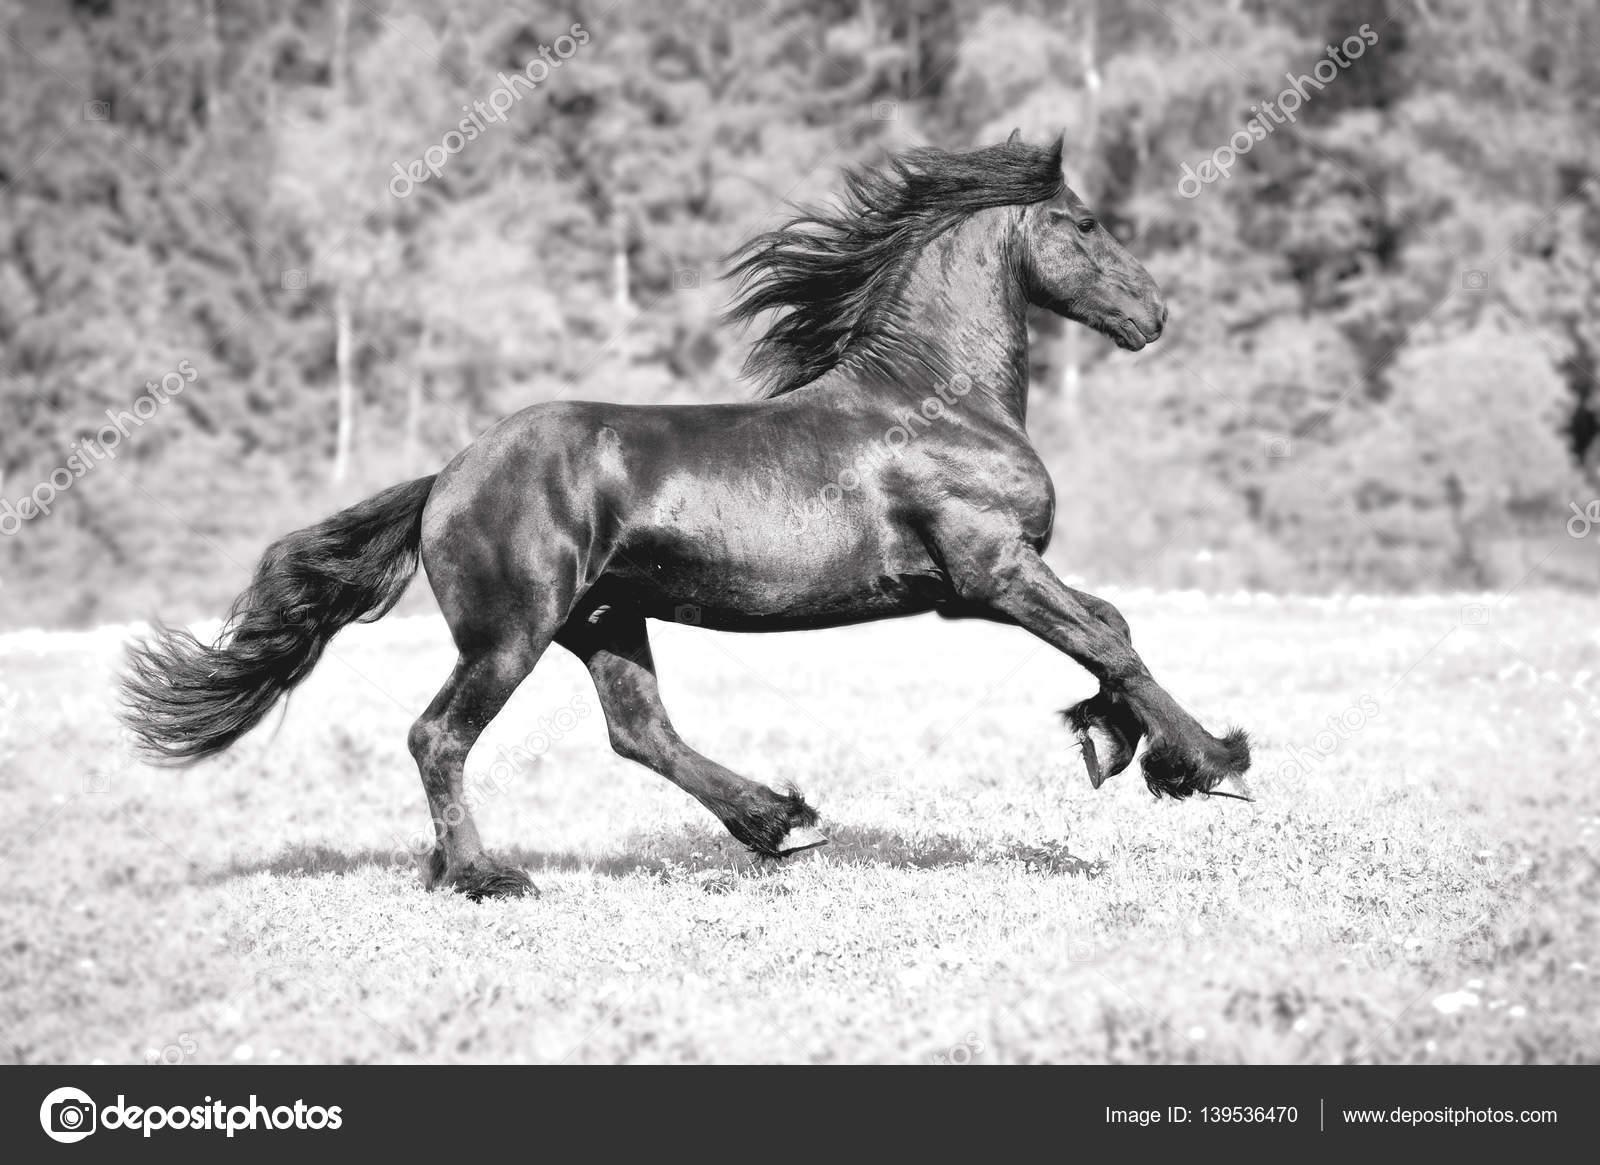 Black And White Friesian Horse Free Friesian Horse Runs Black And White Stock Photo C Olgaru79 139536470